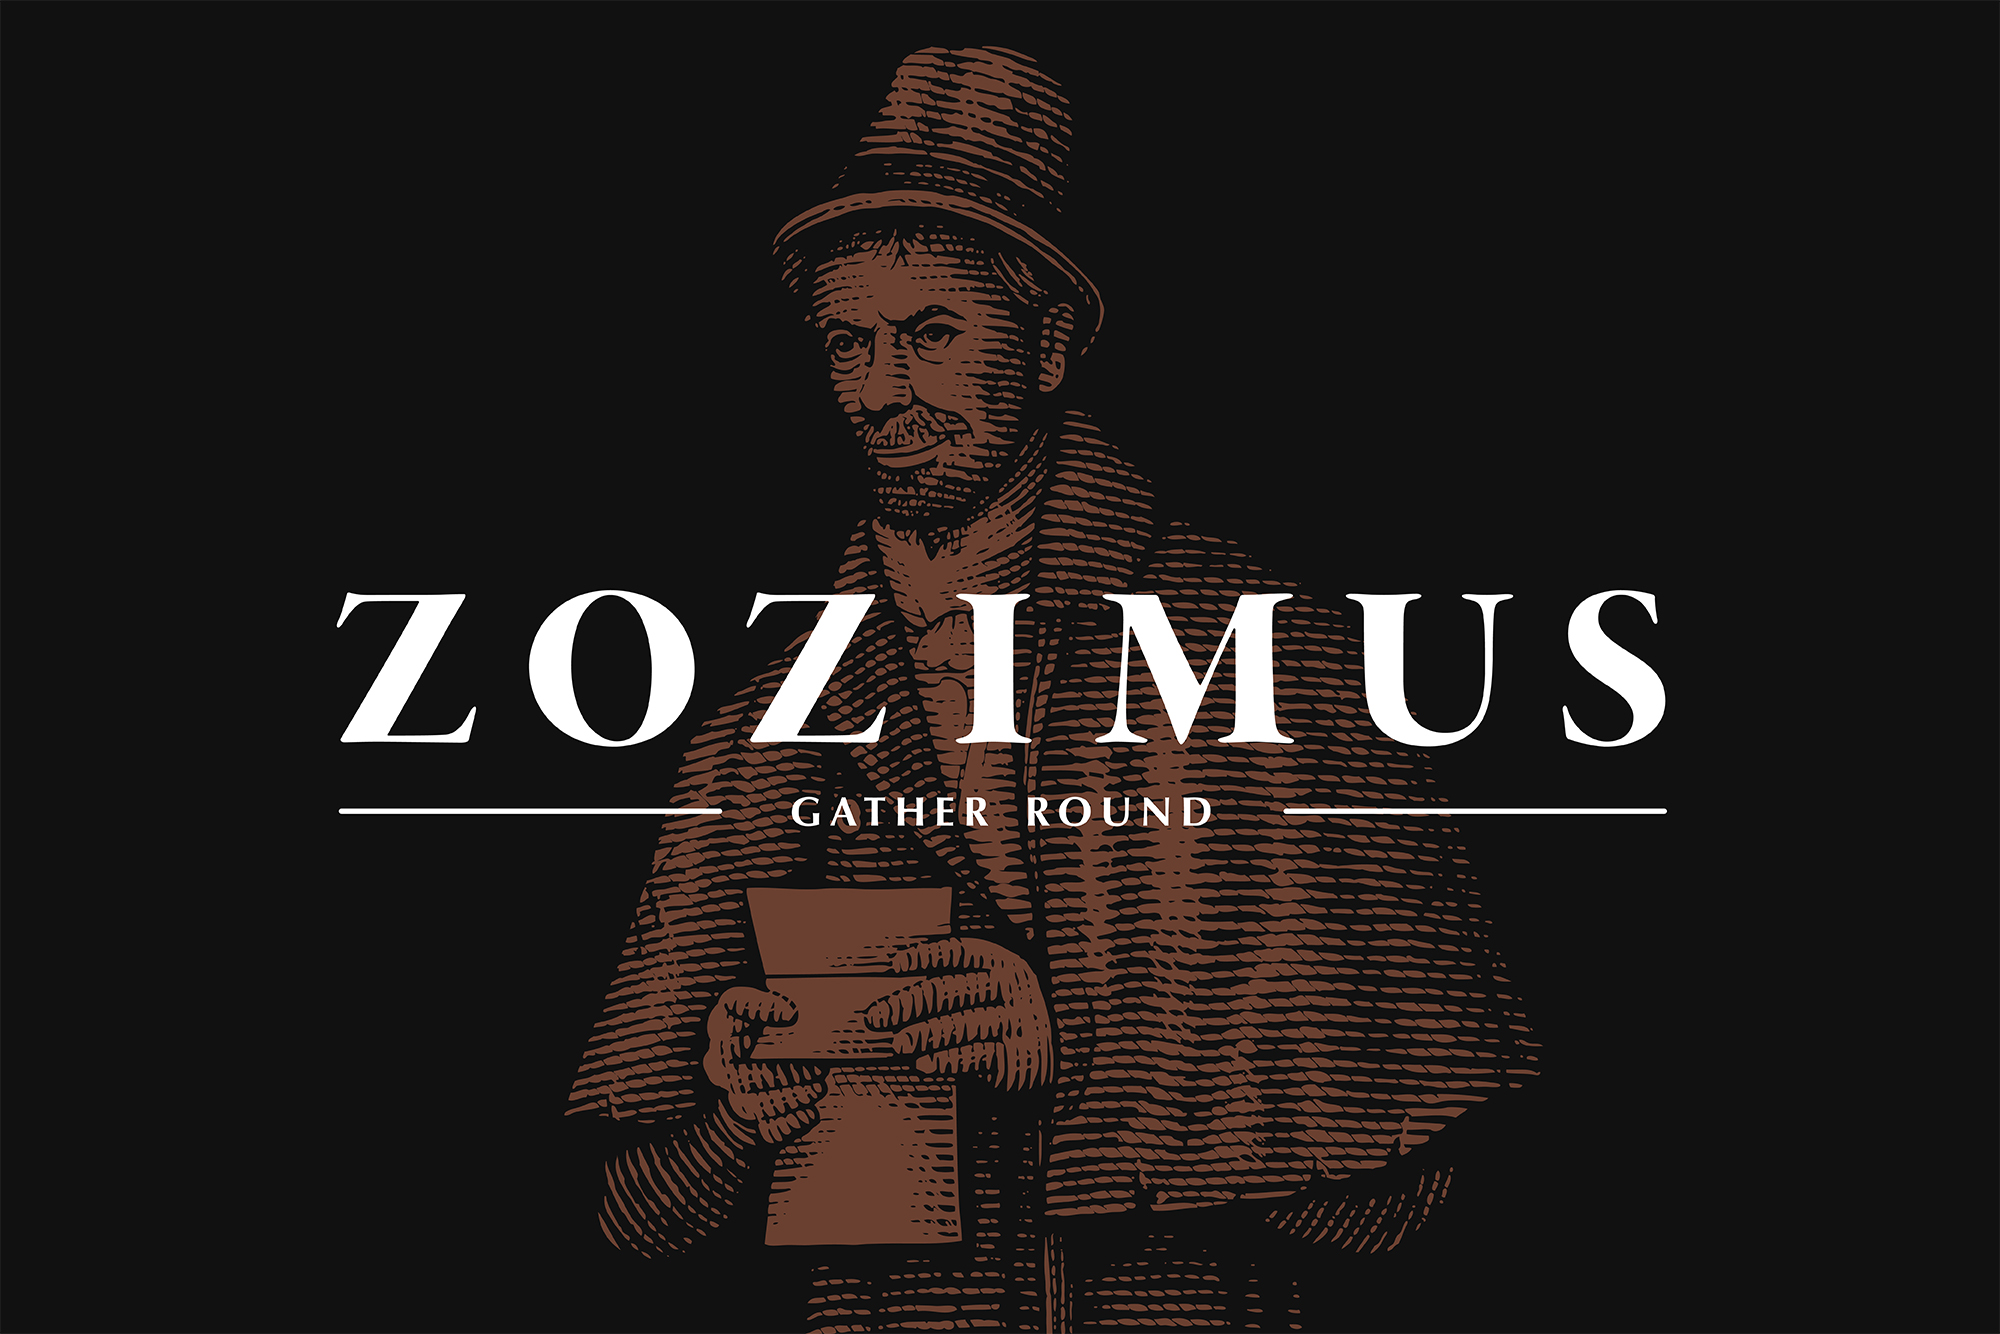 Cover image: Zozimus